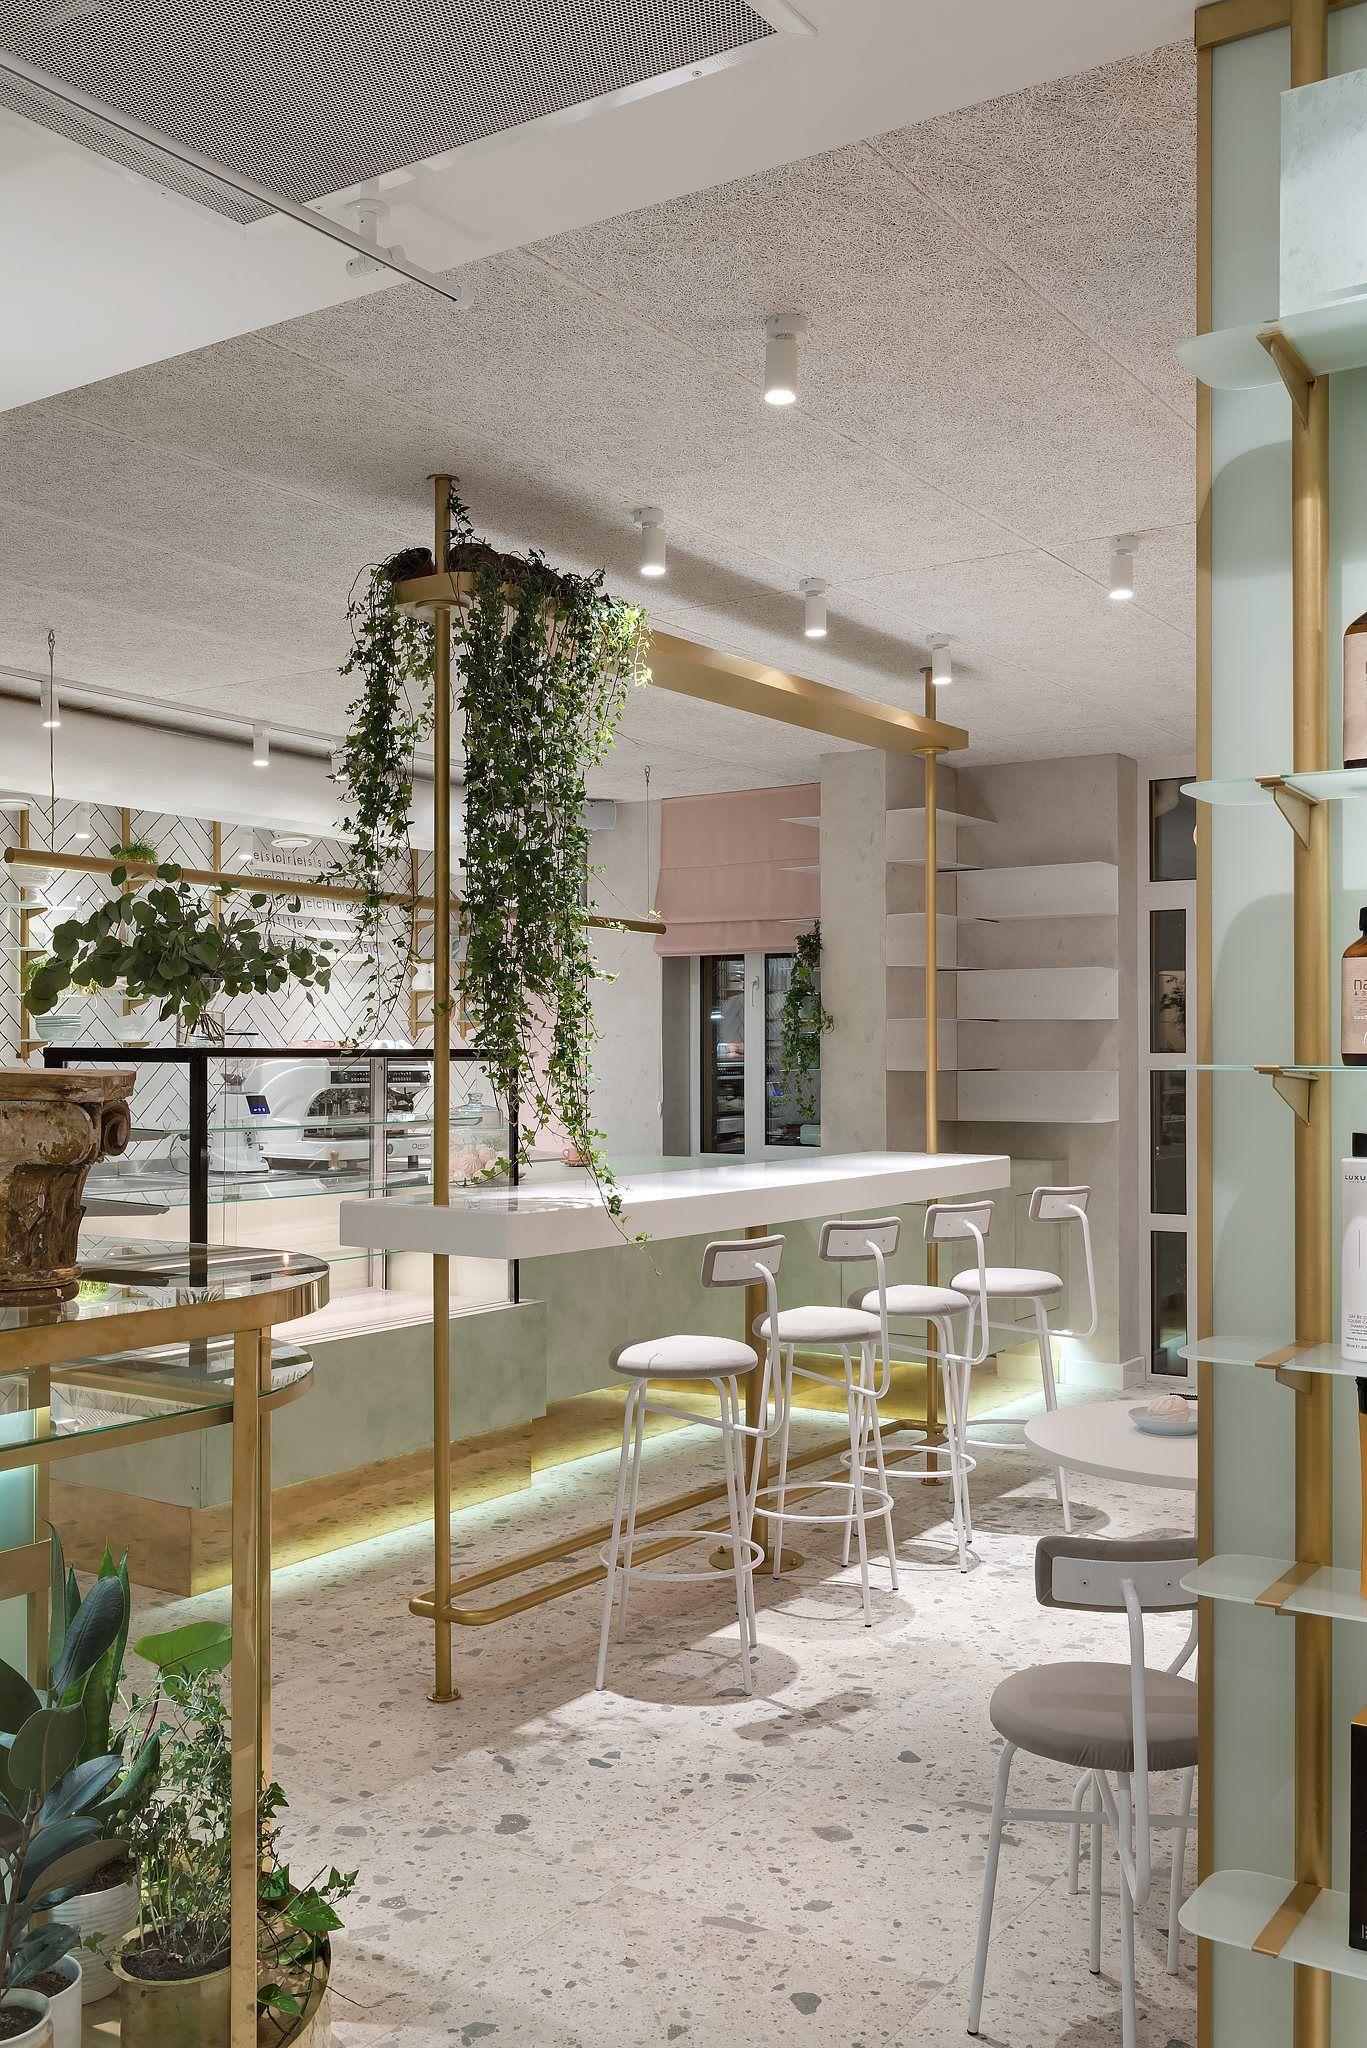 Pin by abby gerdeman on restaurant design in pinterest